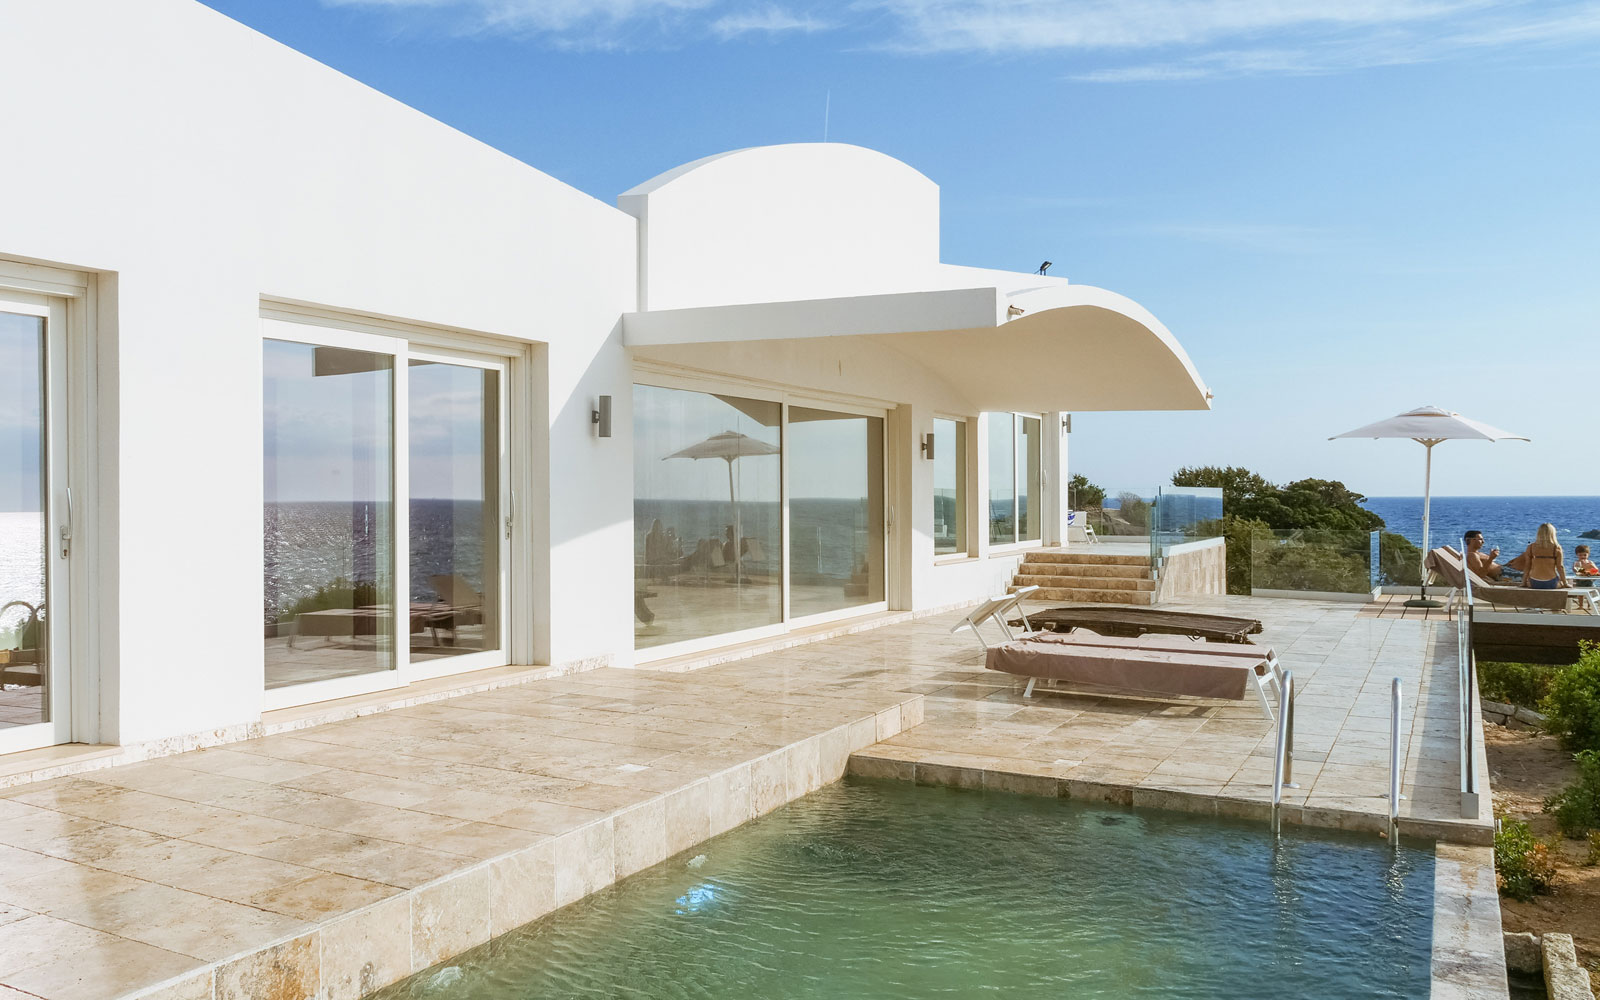 Villa Bellavista at Capo Boi Resort